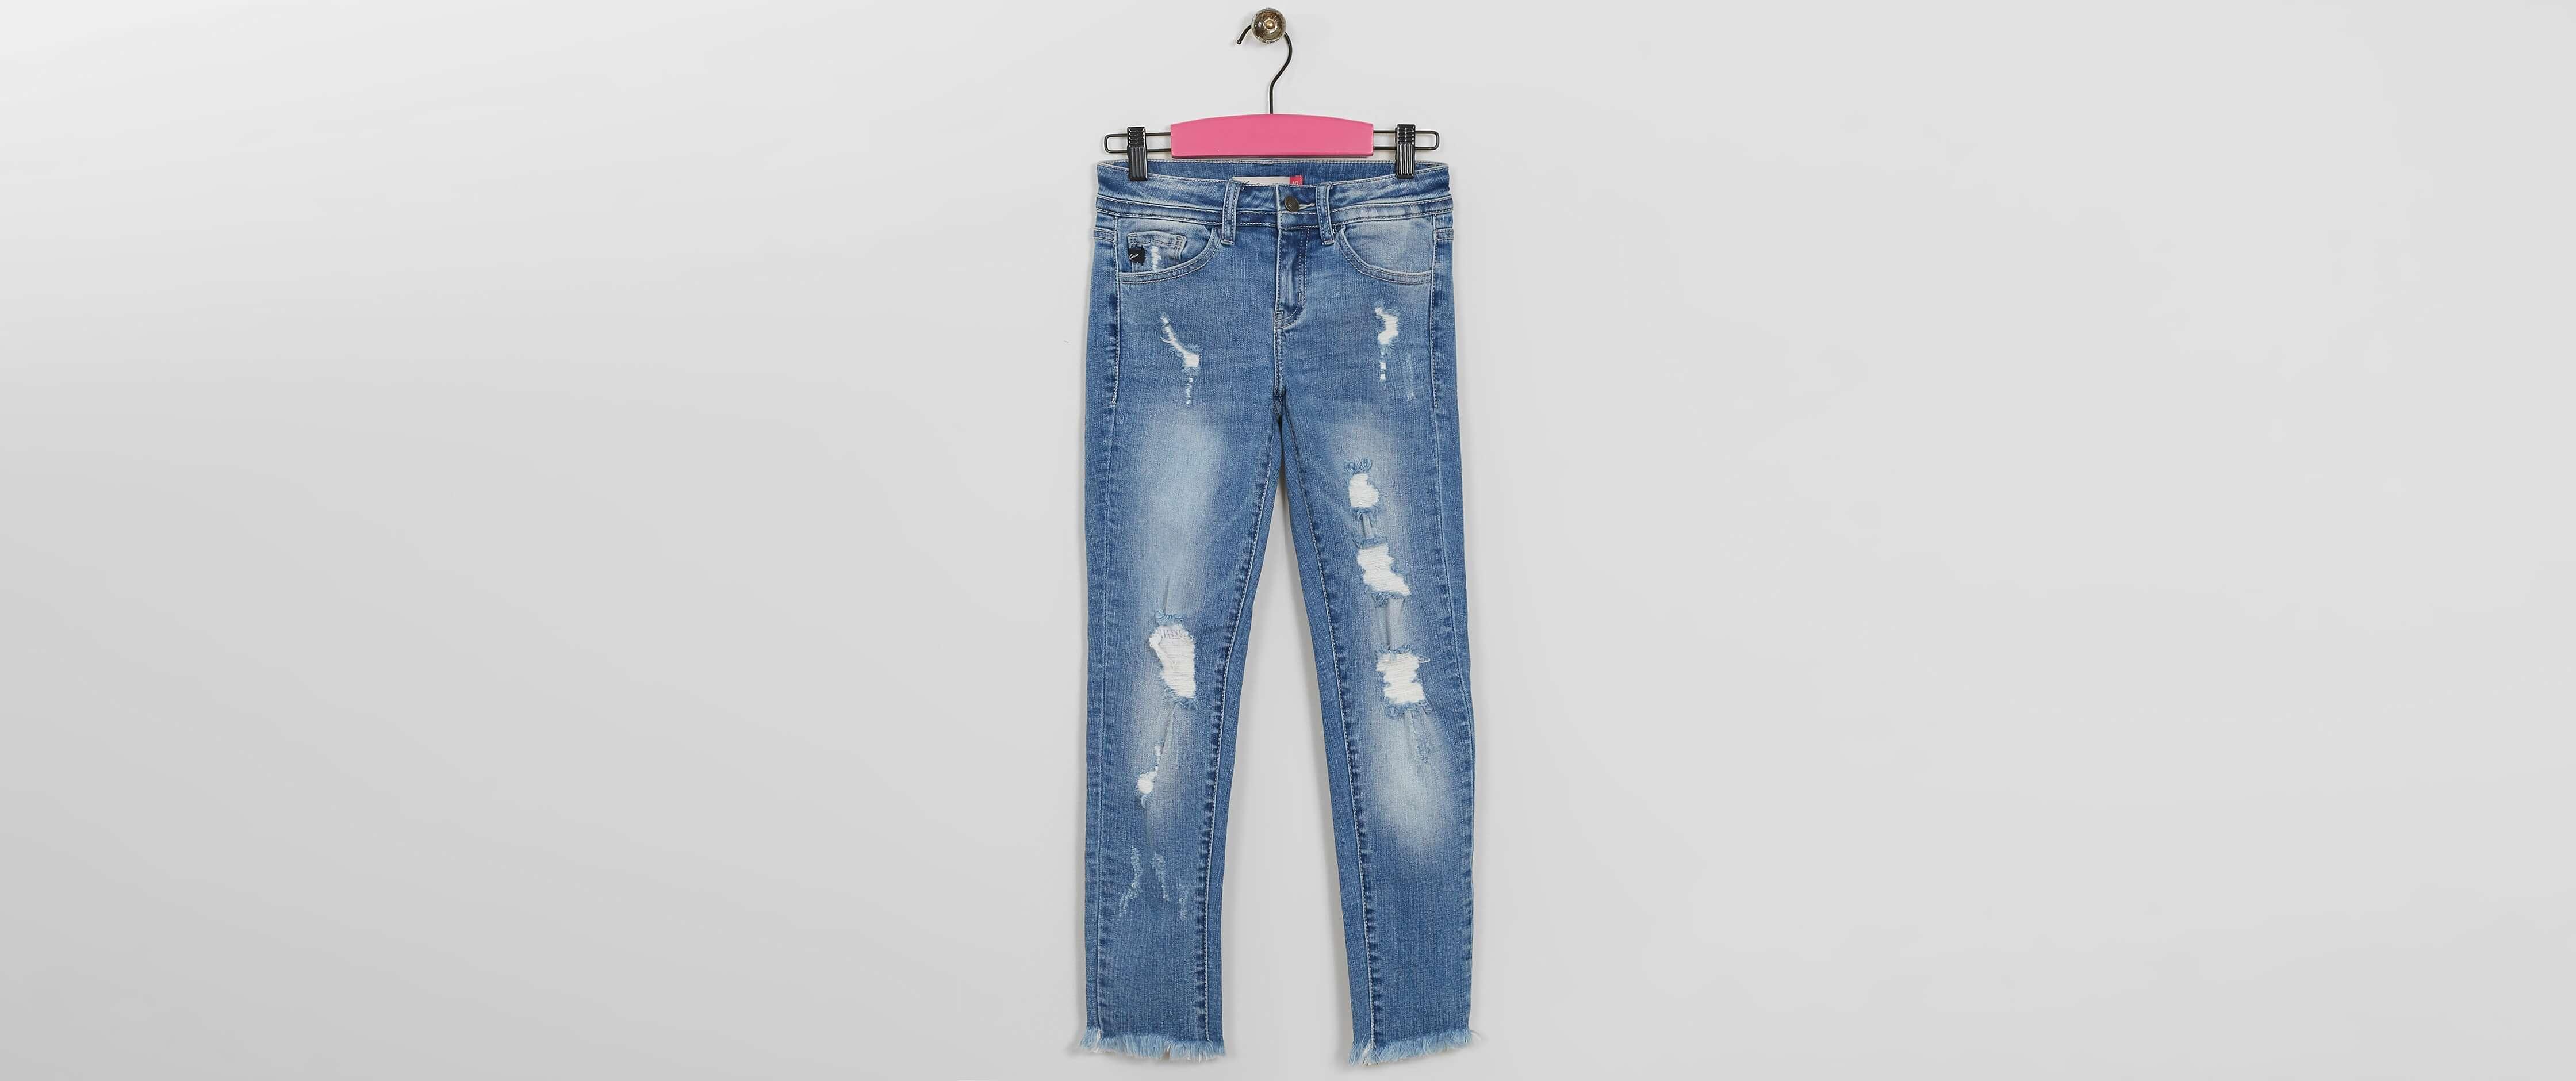 Cheap Girls - KanCan Skinny Stretch Jean supplier